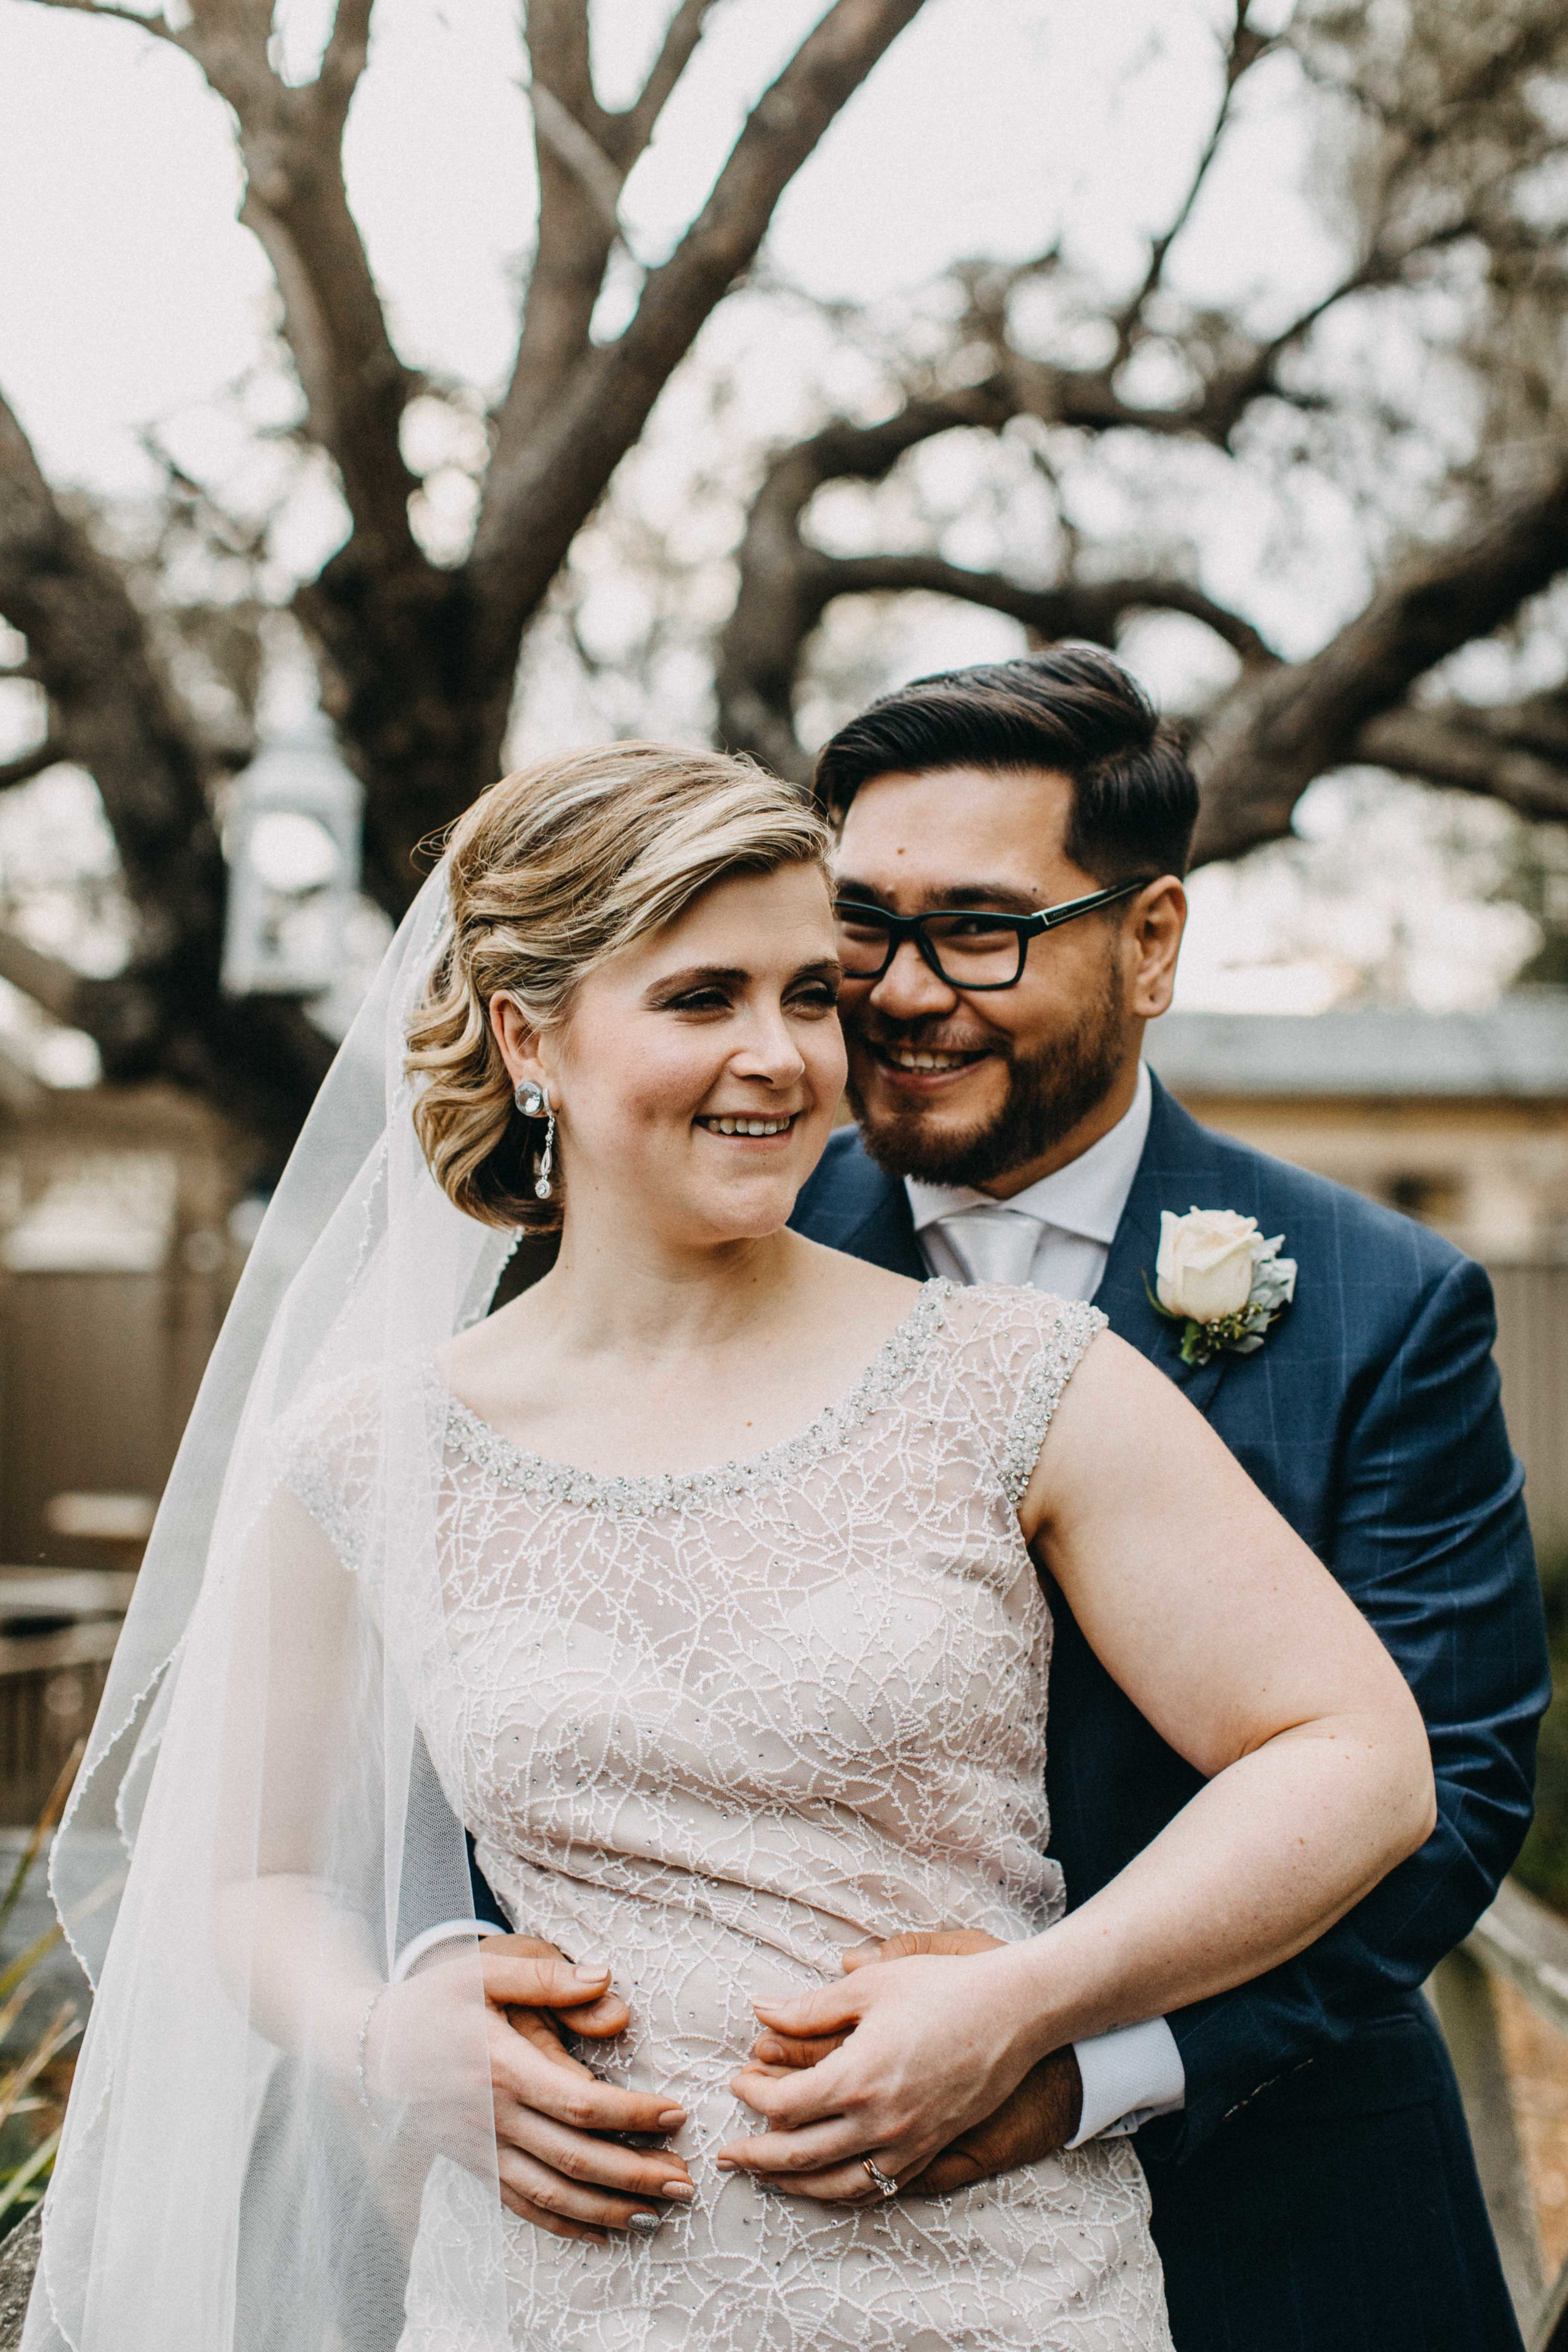 appin-house-wedding-macarthur-www.emilyobrienphotography.net-137.jpg